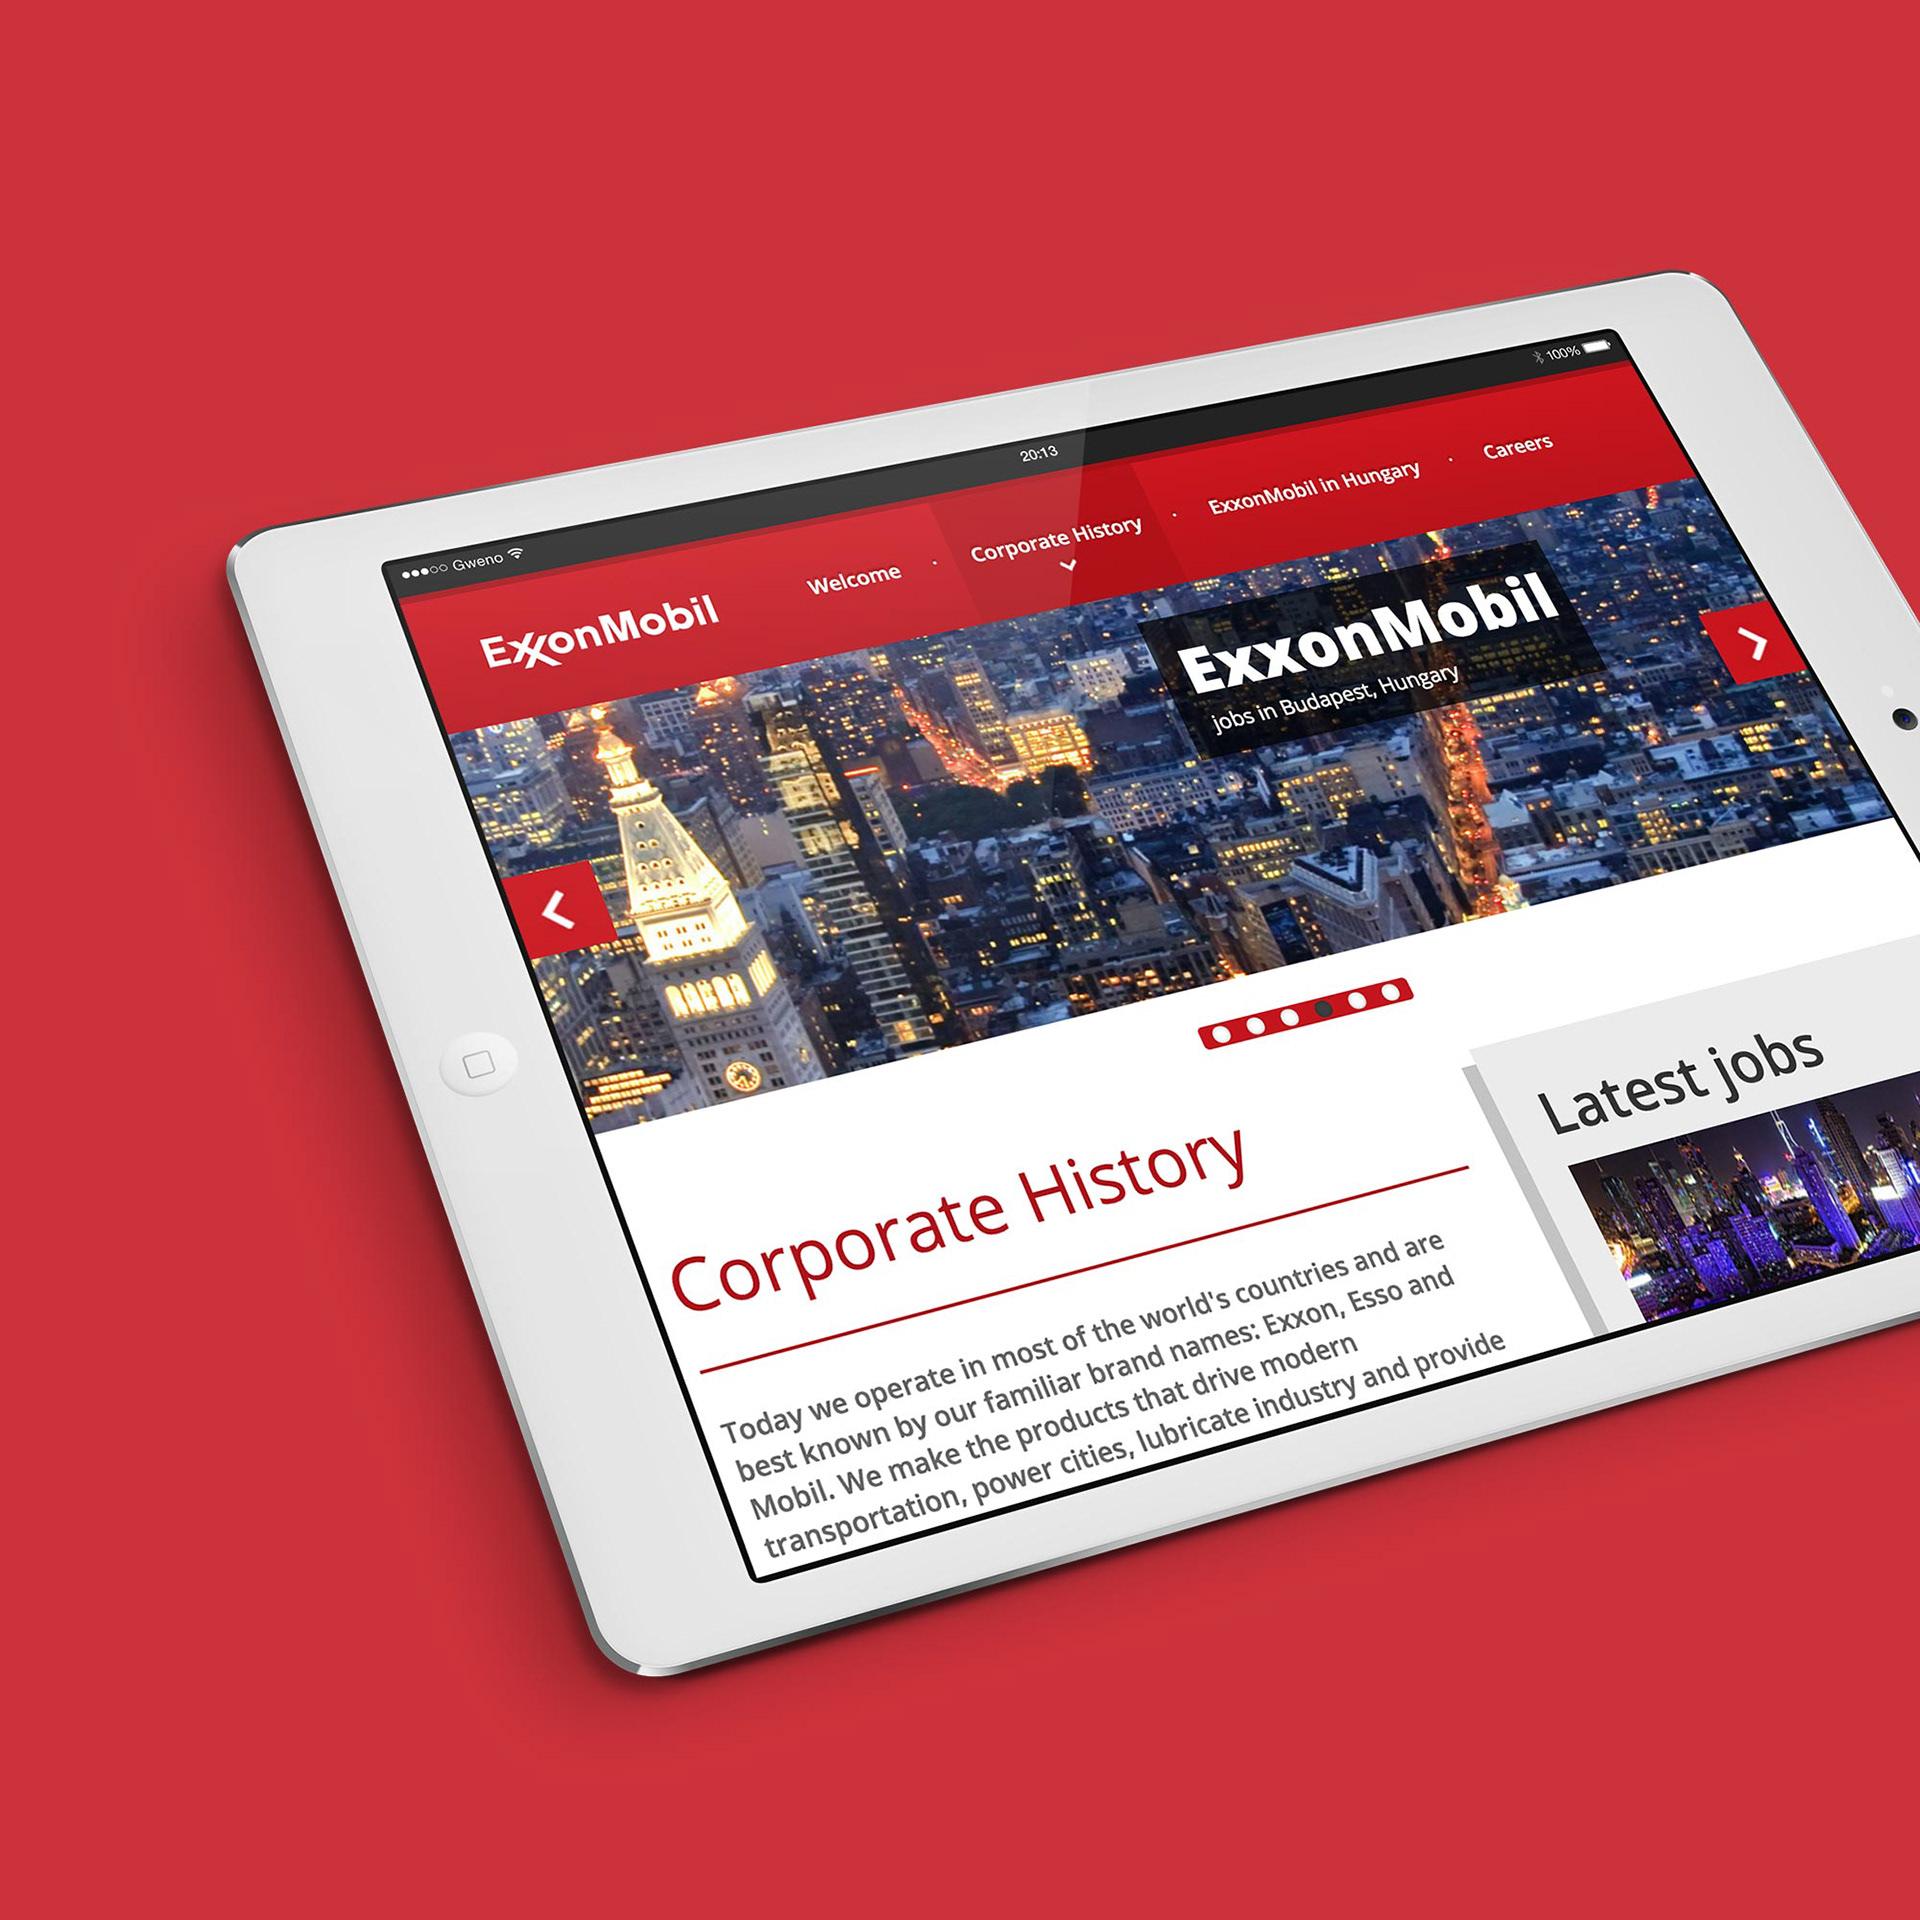 ExxonMobil Recruitment Microsite on Behance